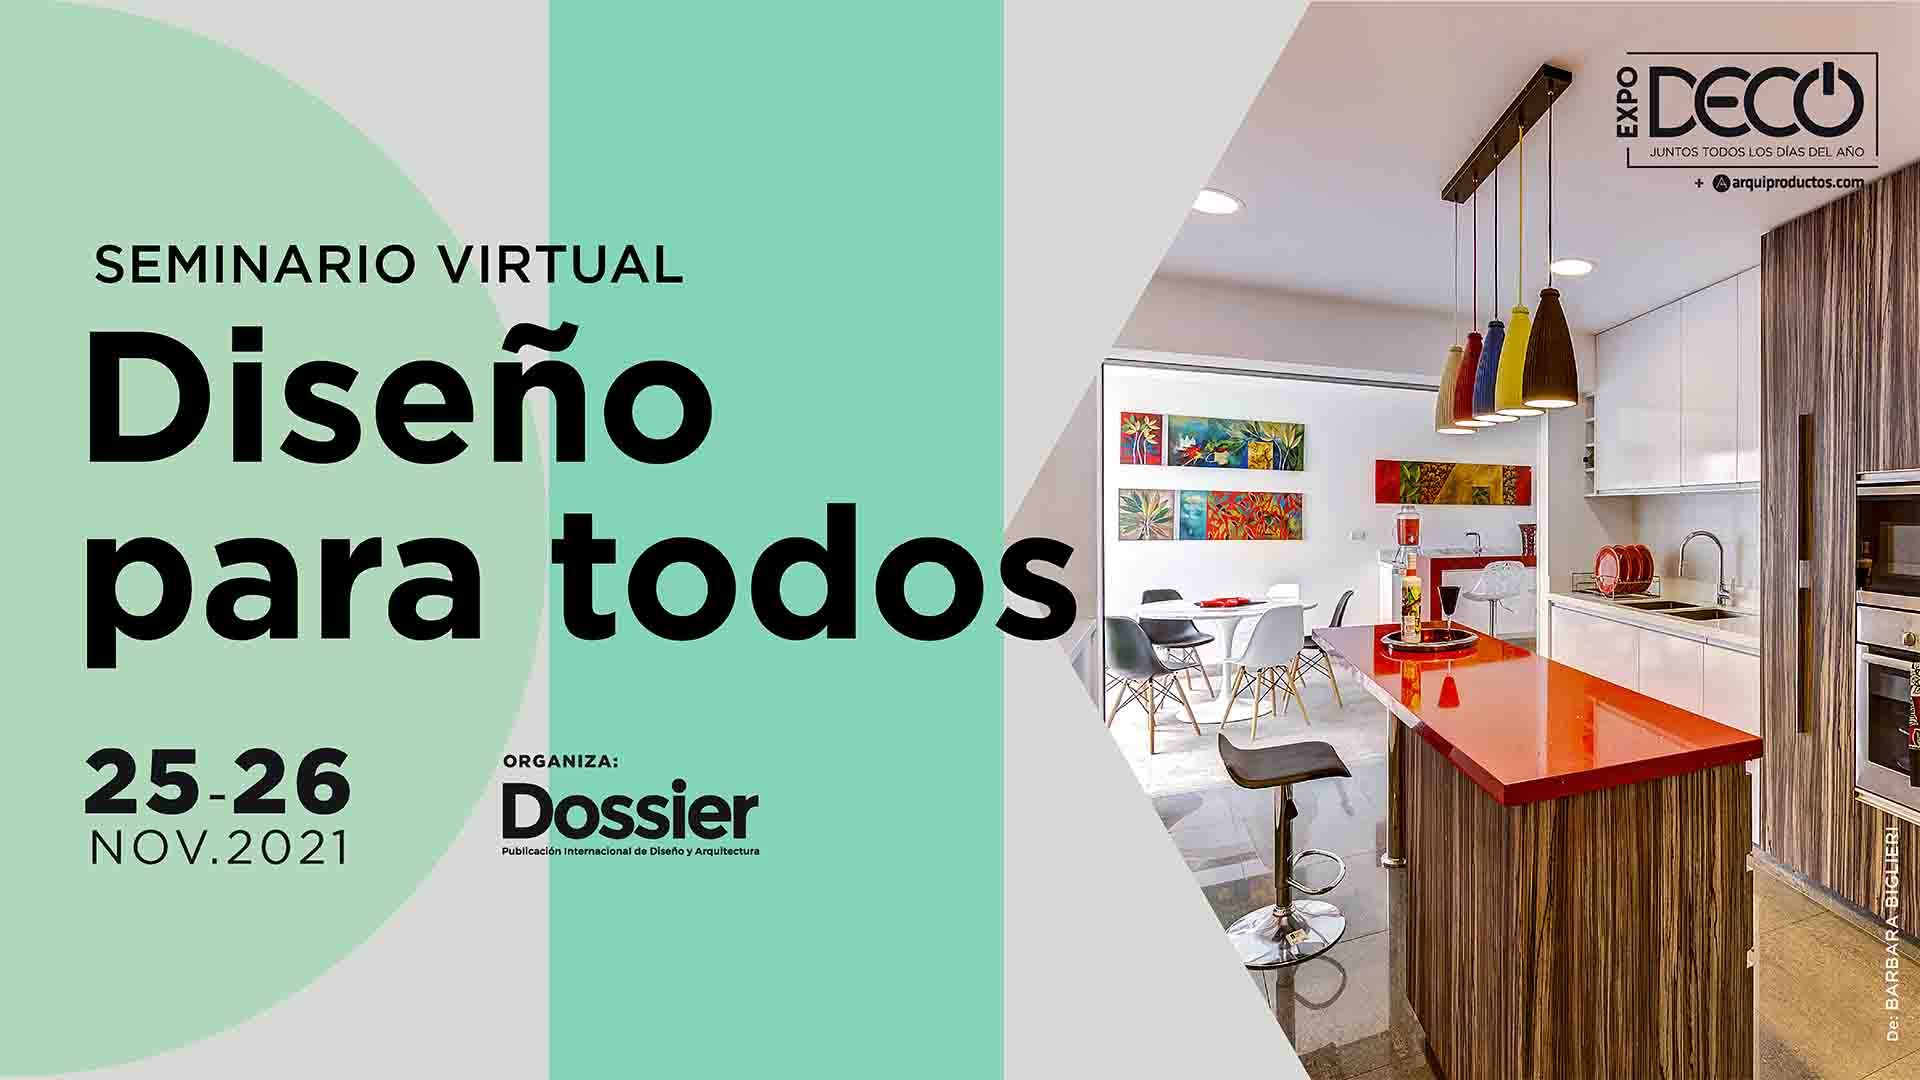 Seminario virtual - Diseño para todos.